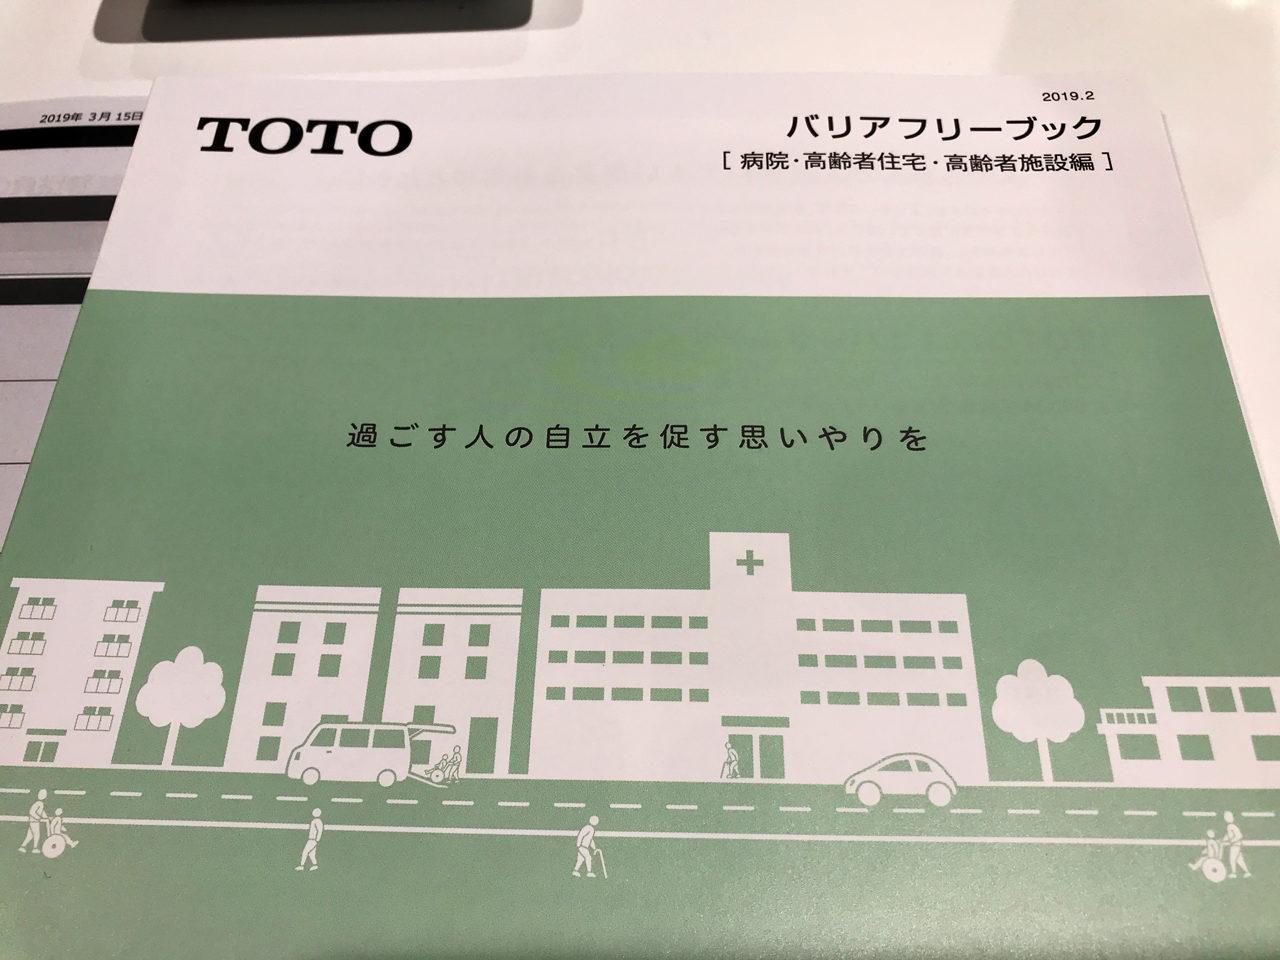 TOTO主催高齢者福祉施設トイレ、水まわりセミナーを受講